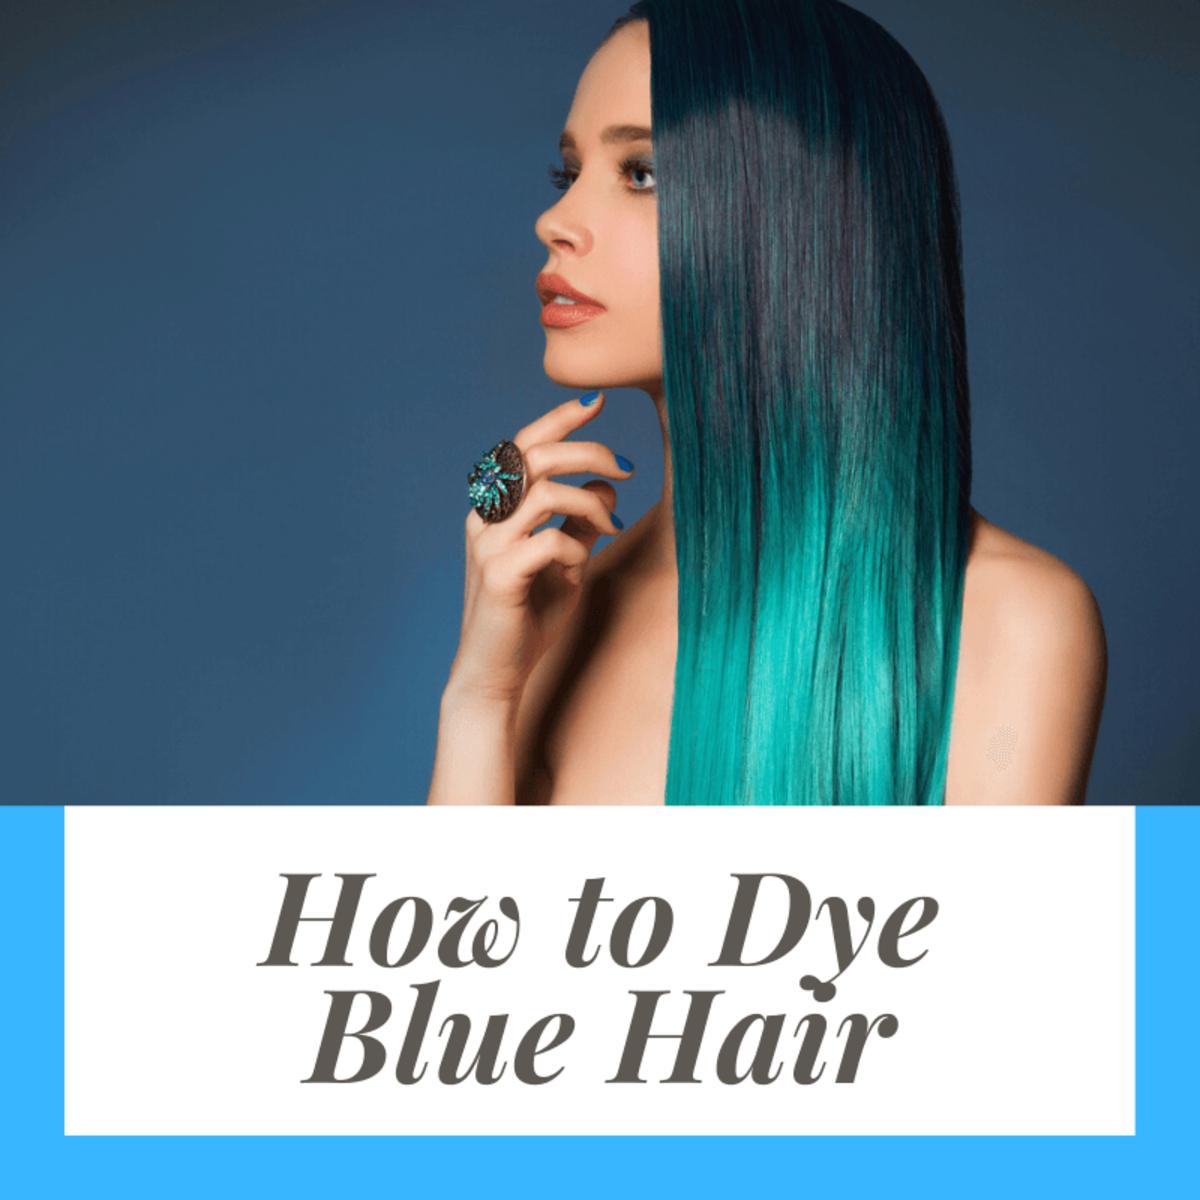 How to Dye Blue Hair